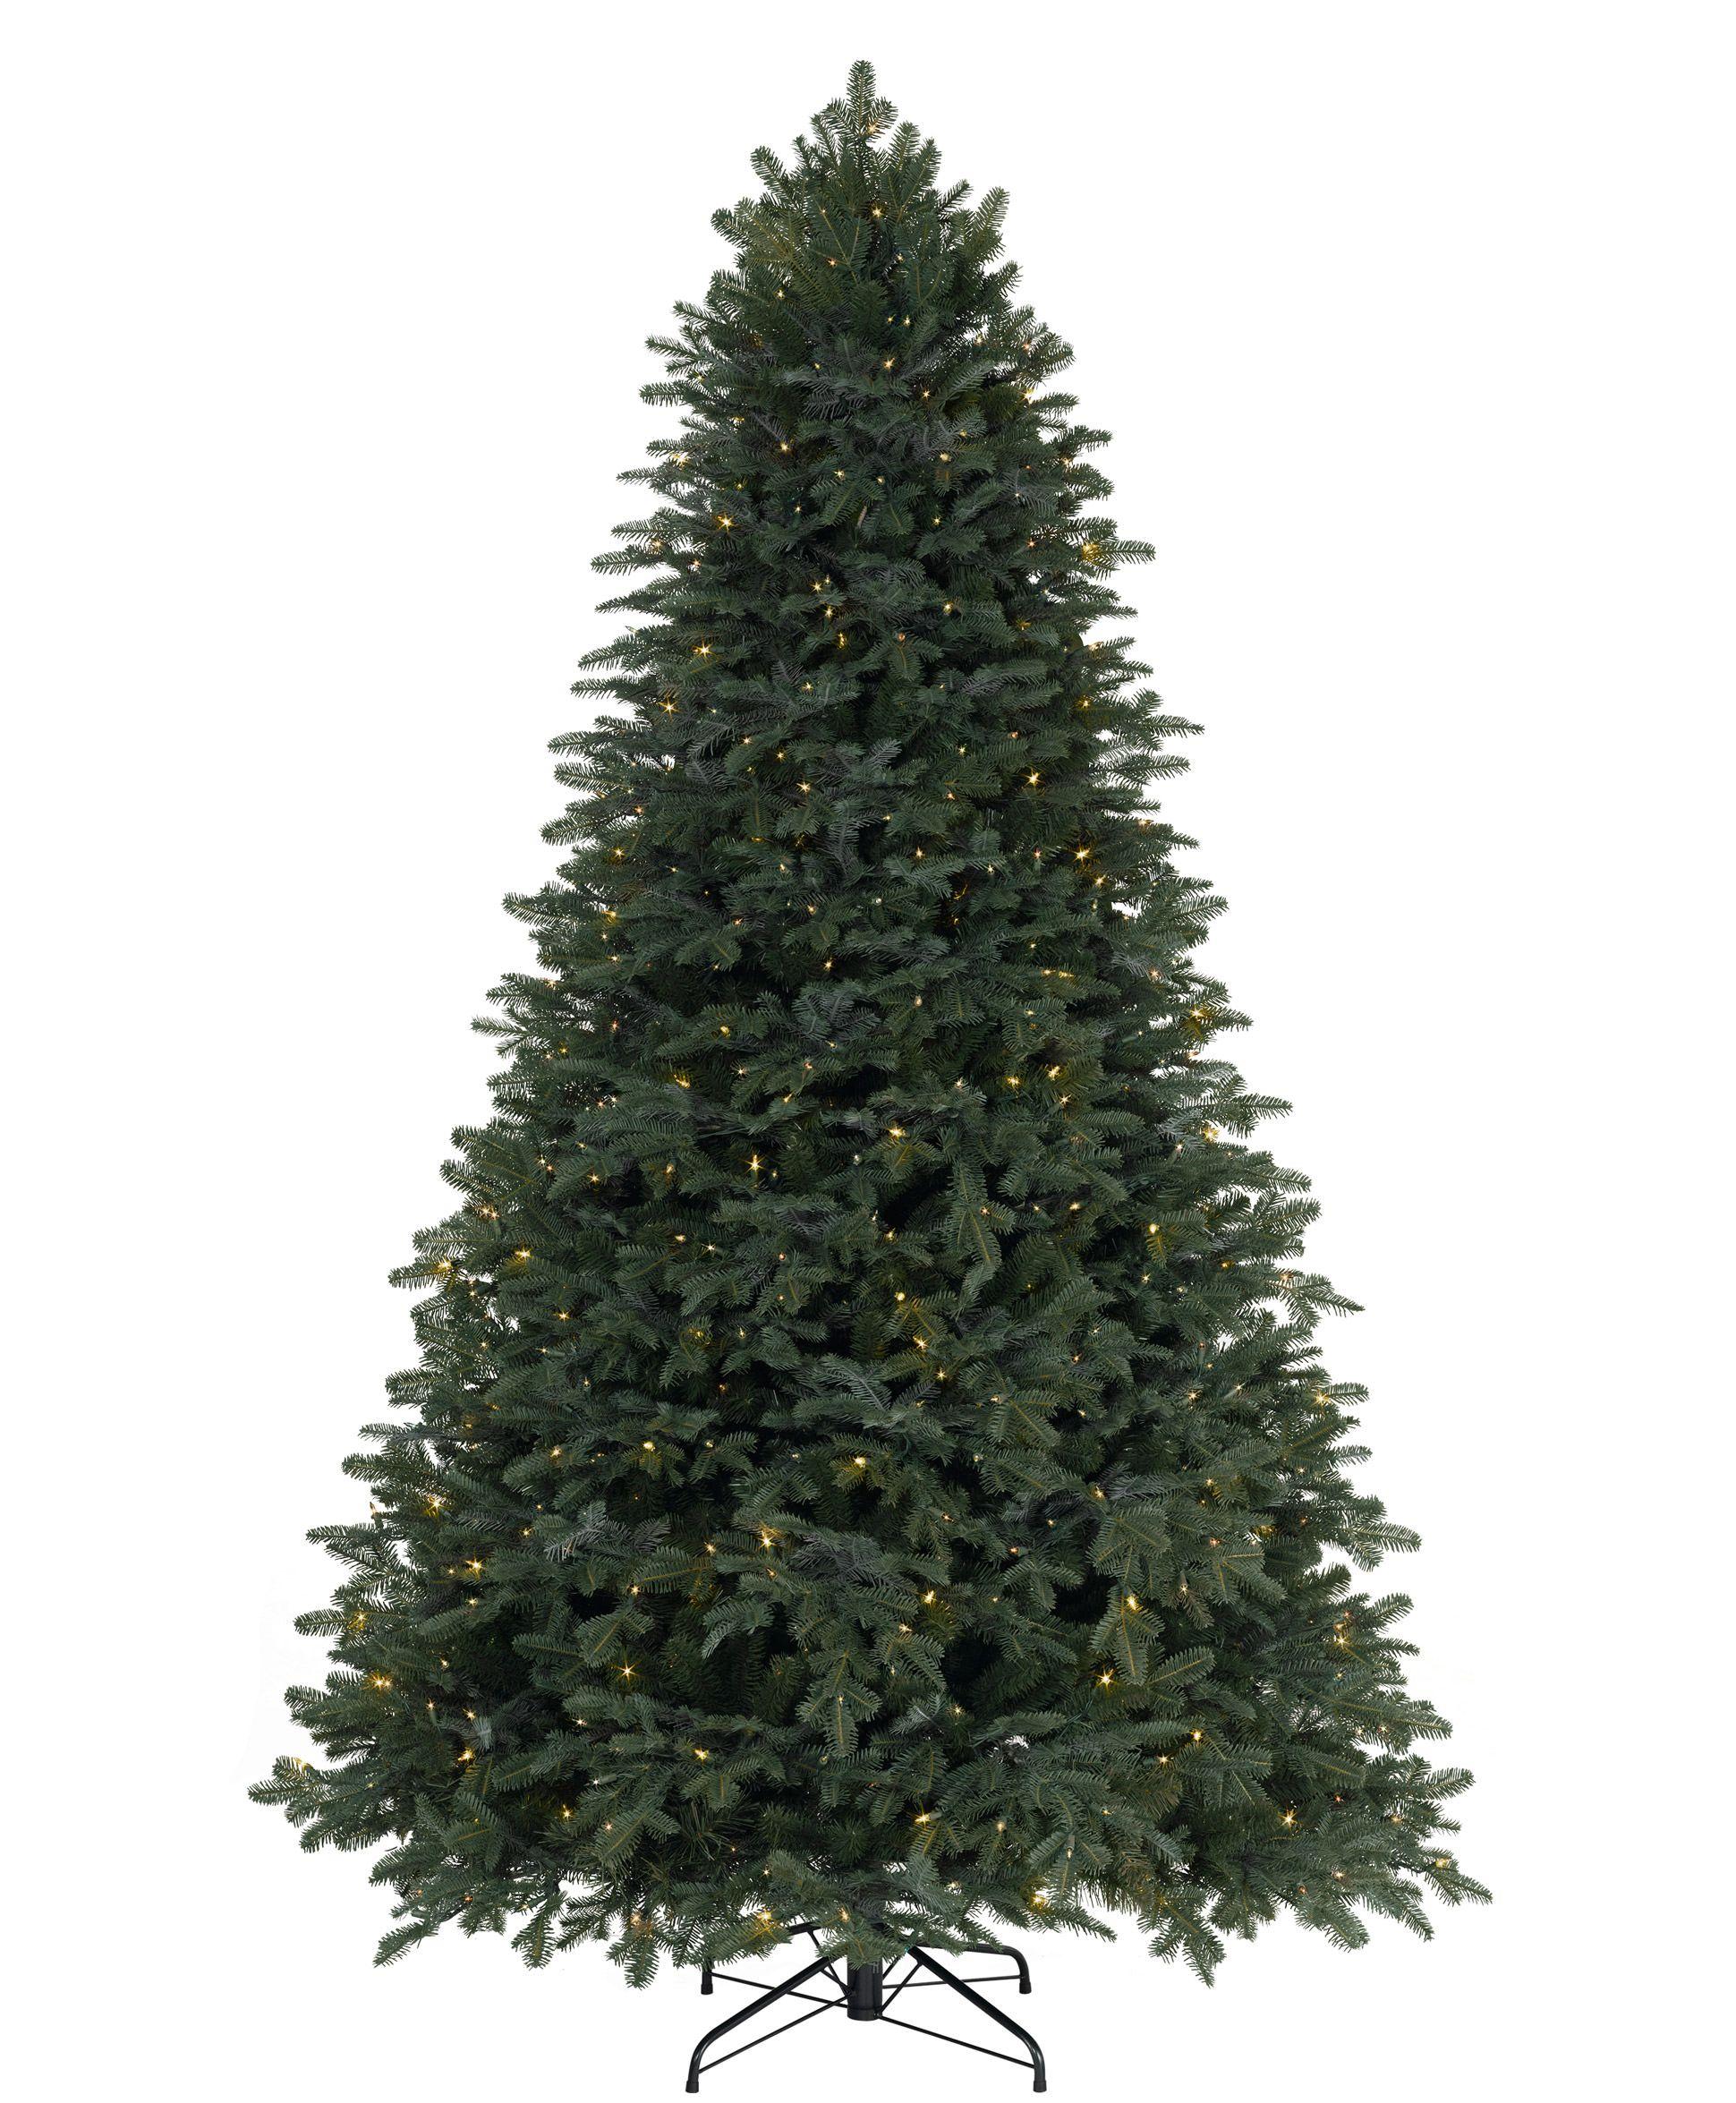 Grand Fir Christmas Tree Spruce Christmas Tree Fir Christmas Tree Realistic Artificial Christmas Trees